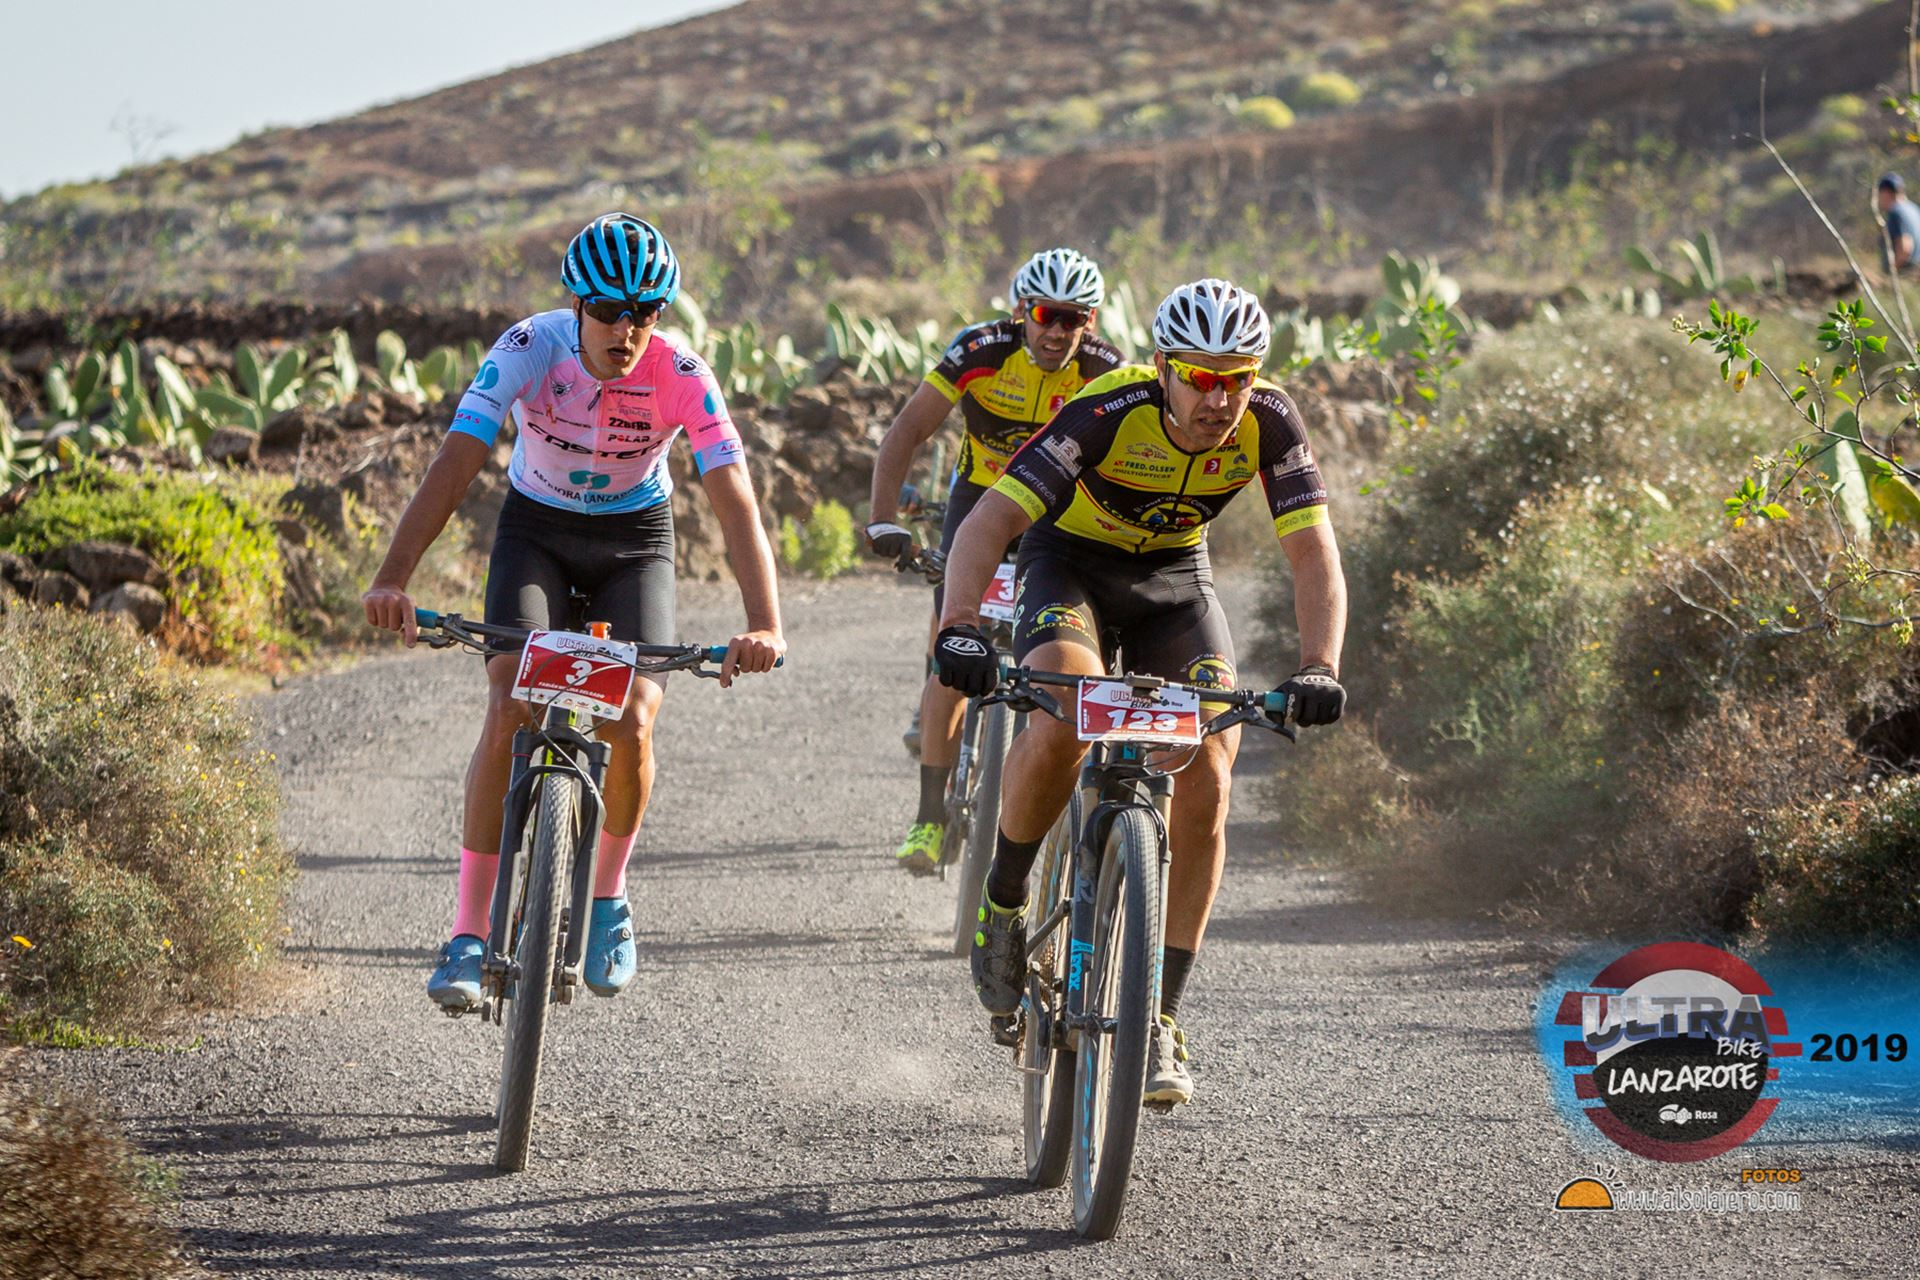 Sector Guatiza 2ª Etapa Ultrabike 2019 Fotos Alsolajero.com-4